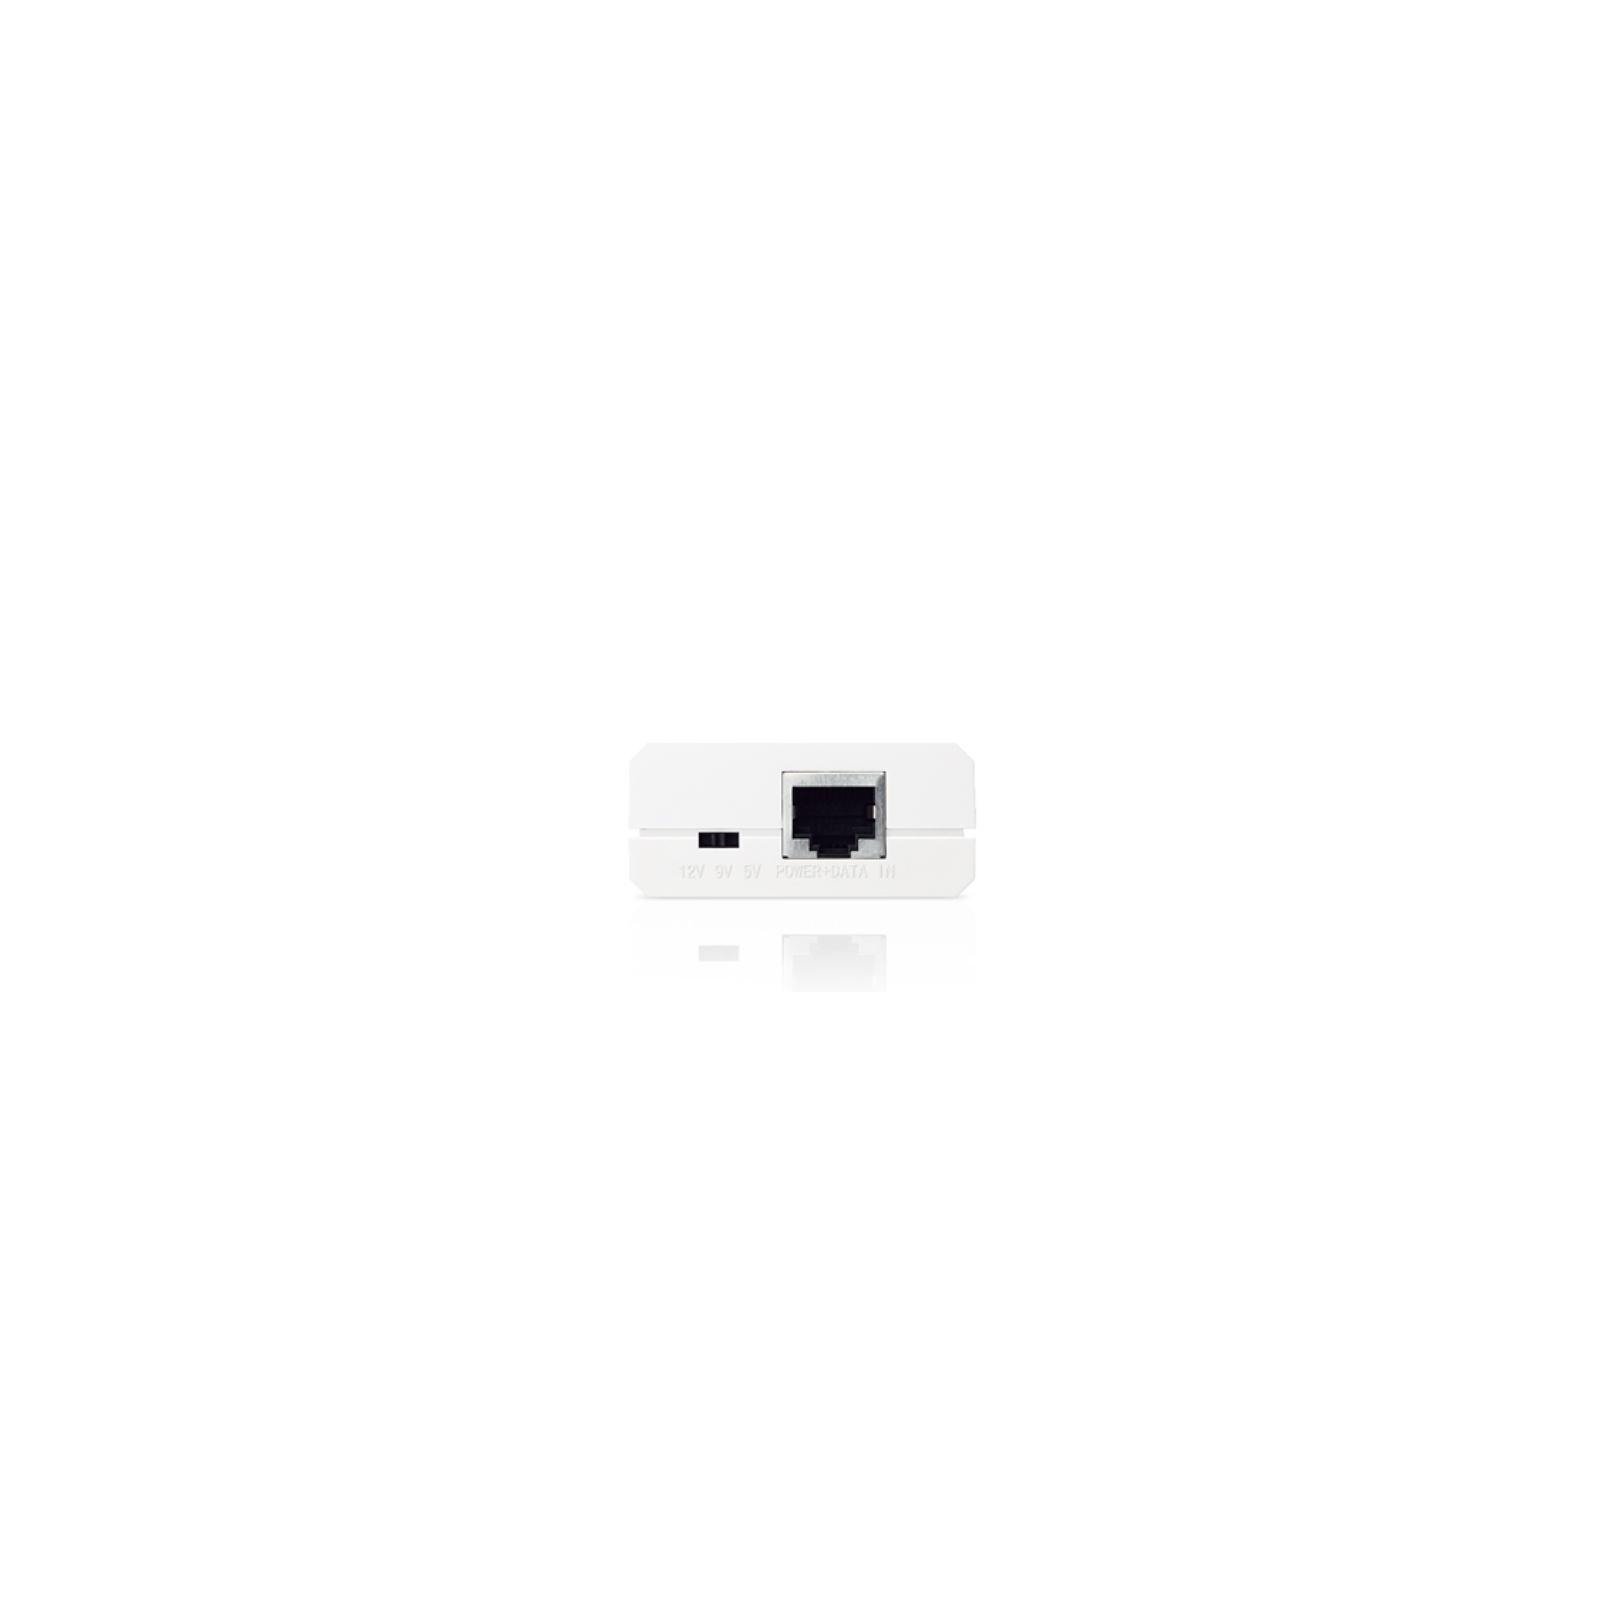 Адаптер PoE TP-Link TL-POE200 изображение 4